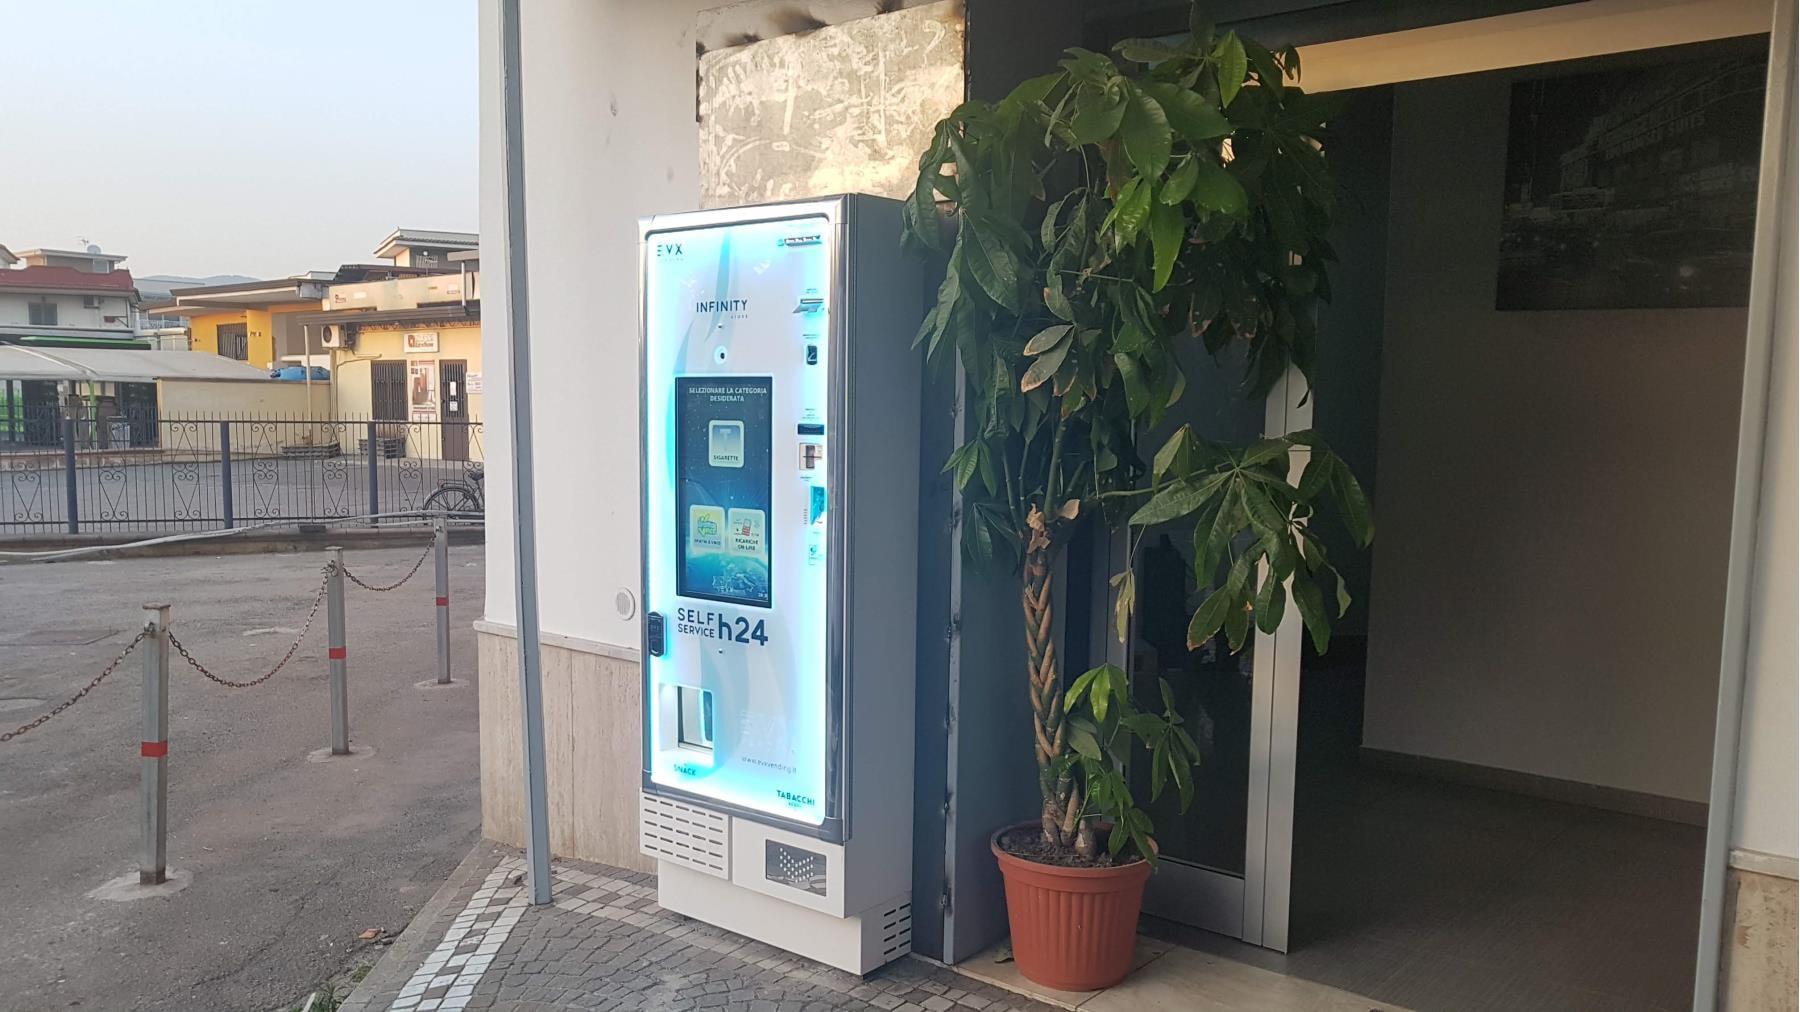 distributore-automatico-sigarette-evx-infinity_store